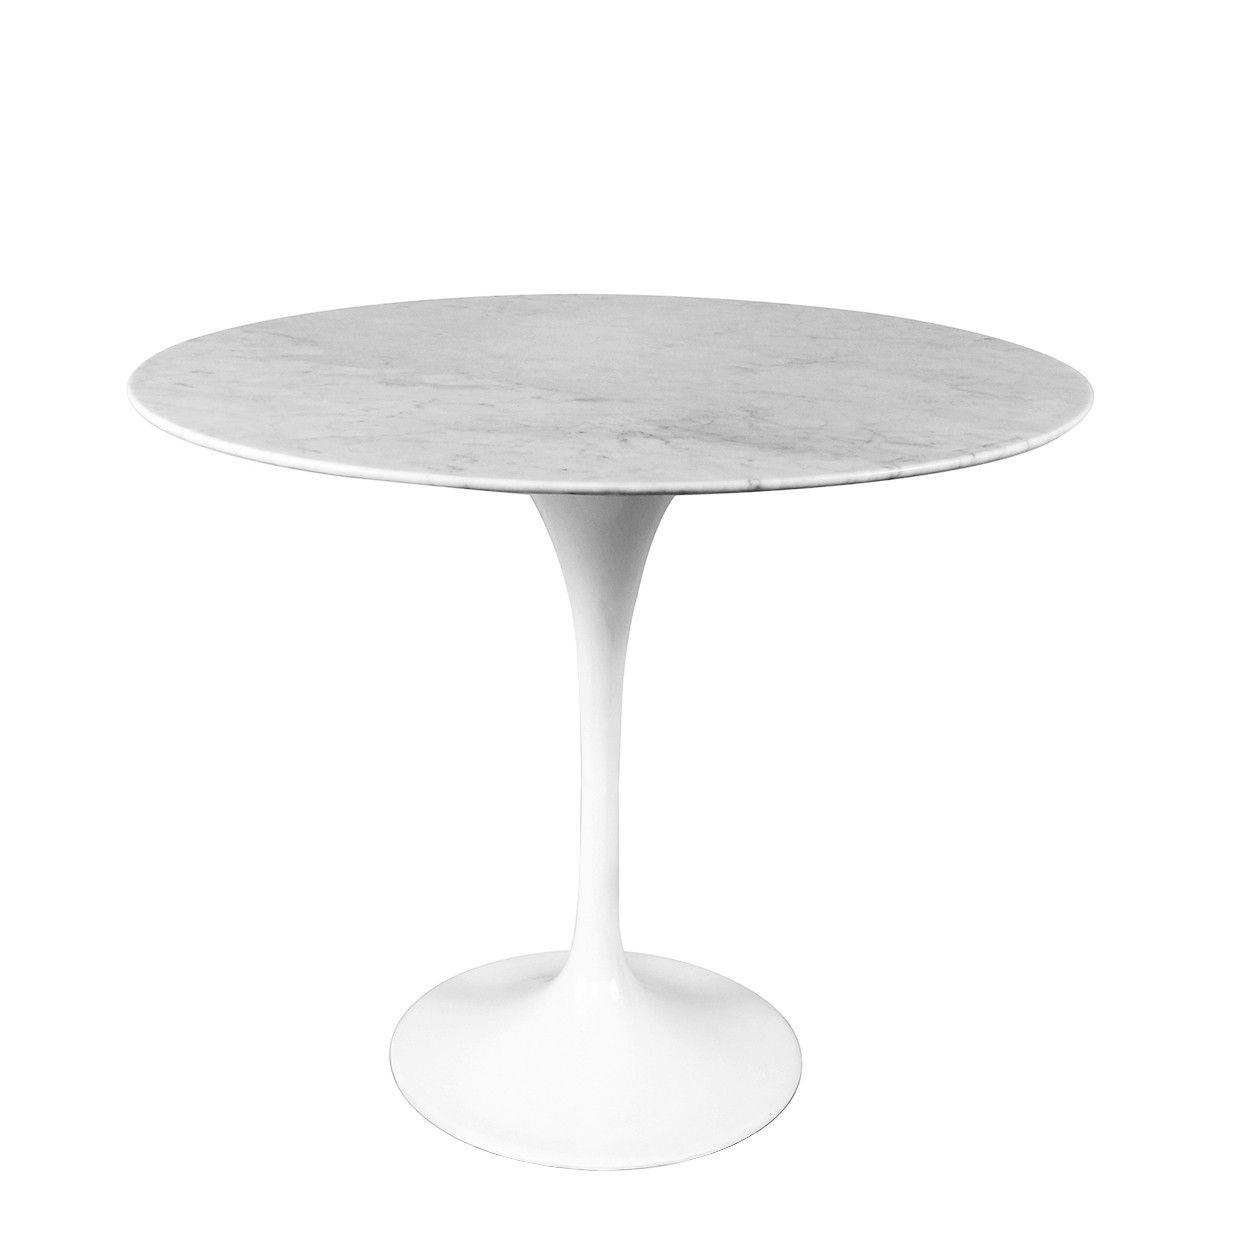 Rt335swhite Reproduction Saarinen Marble Tulip Side Table Tulip Side Table Side Table White Side Tables